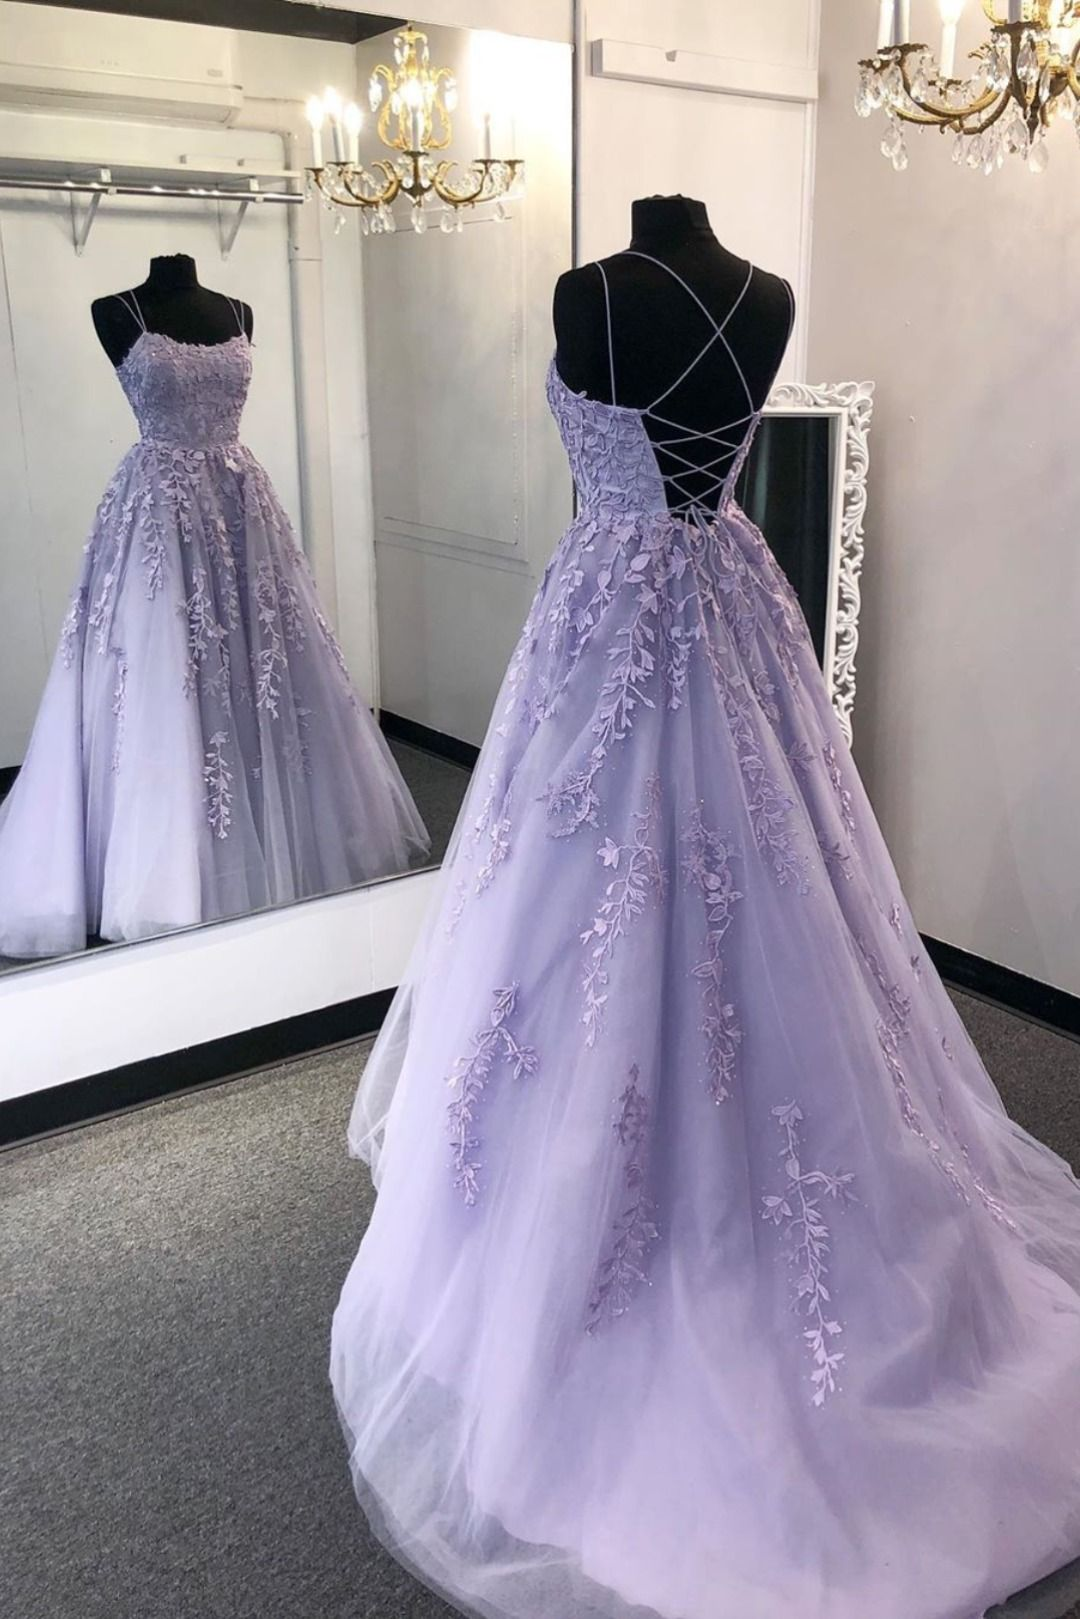 2020 Lavender Prom Dress